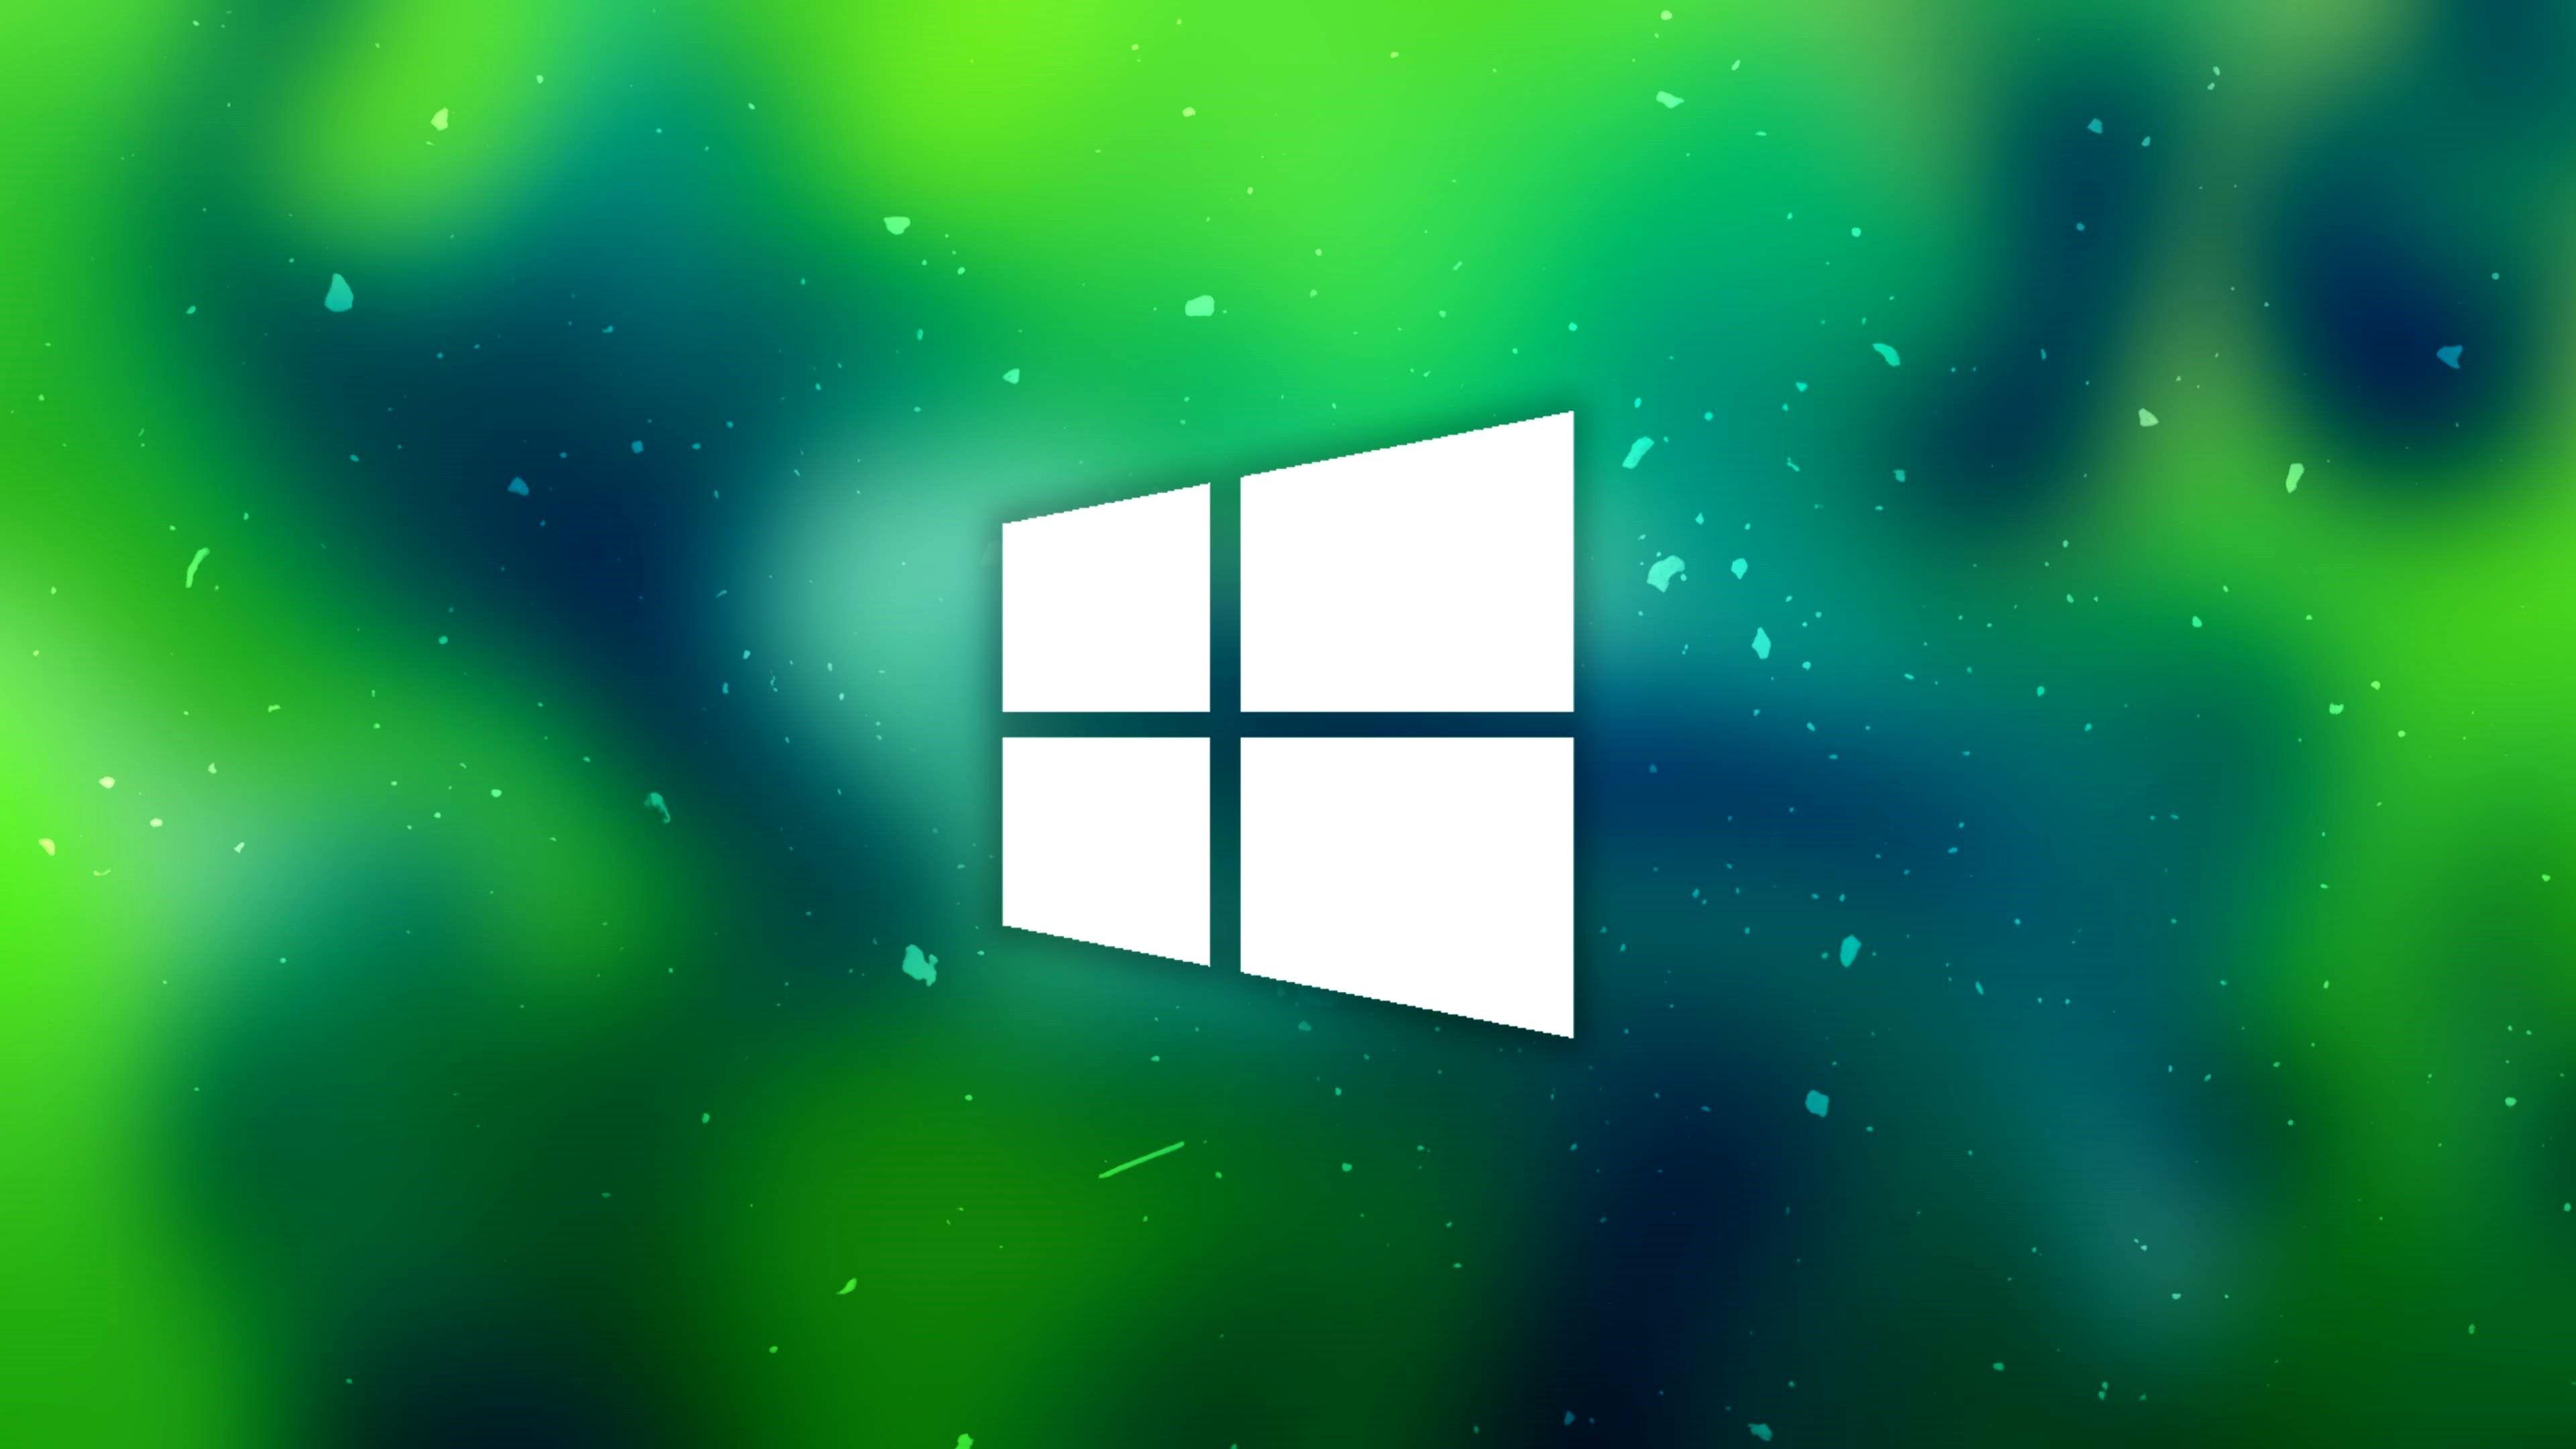 4K Wallpaper Download For Pc Windows 7 Ideas 4K, 2020